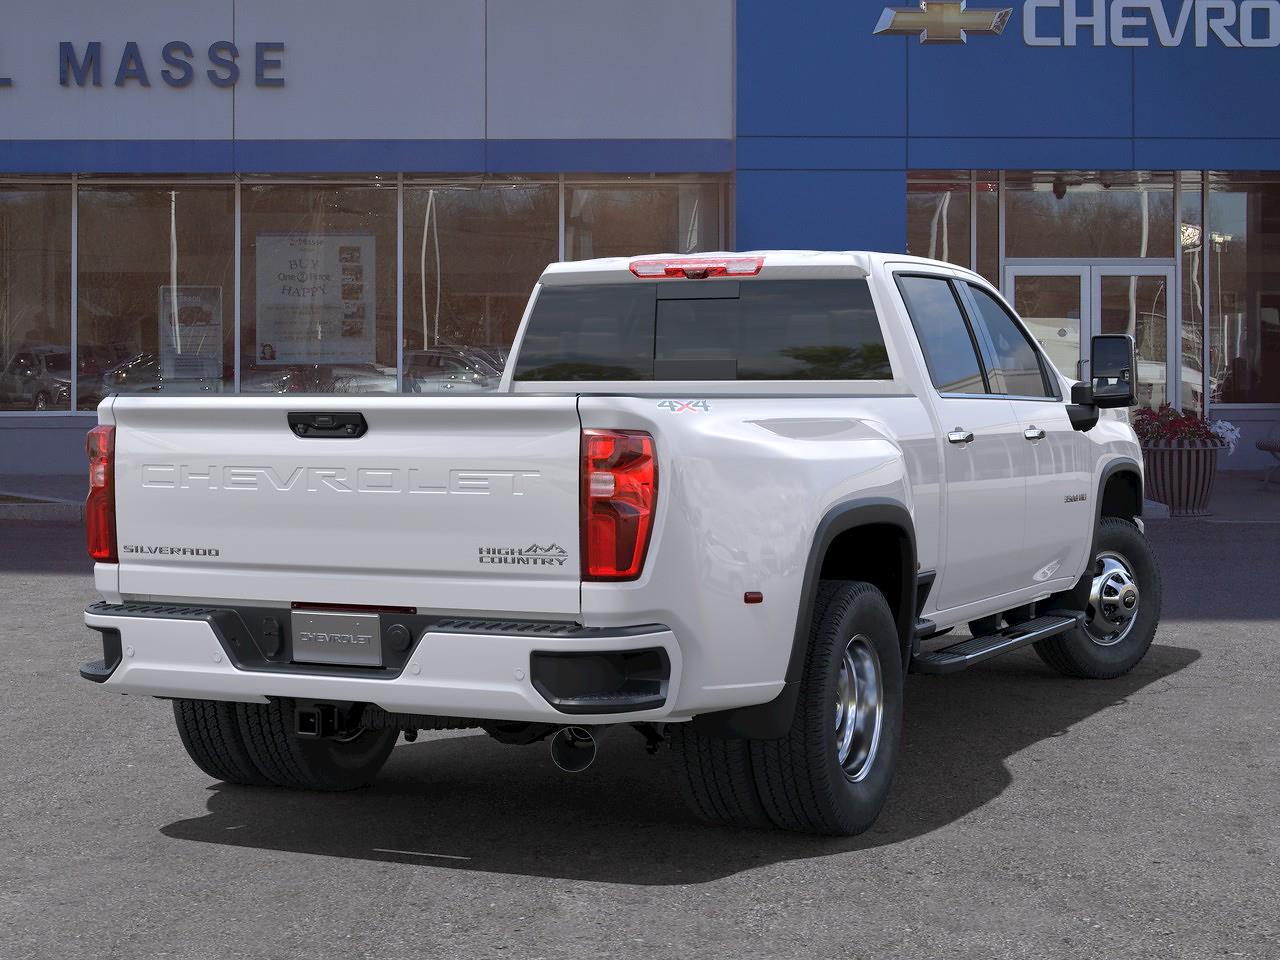 2021 Chevrolet Silverado 3500 Crew Cab 4x4, Pickup #CK1380 - photo 2